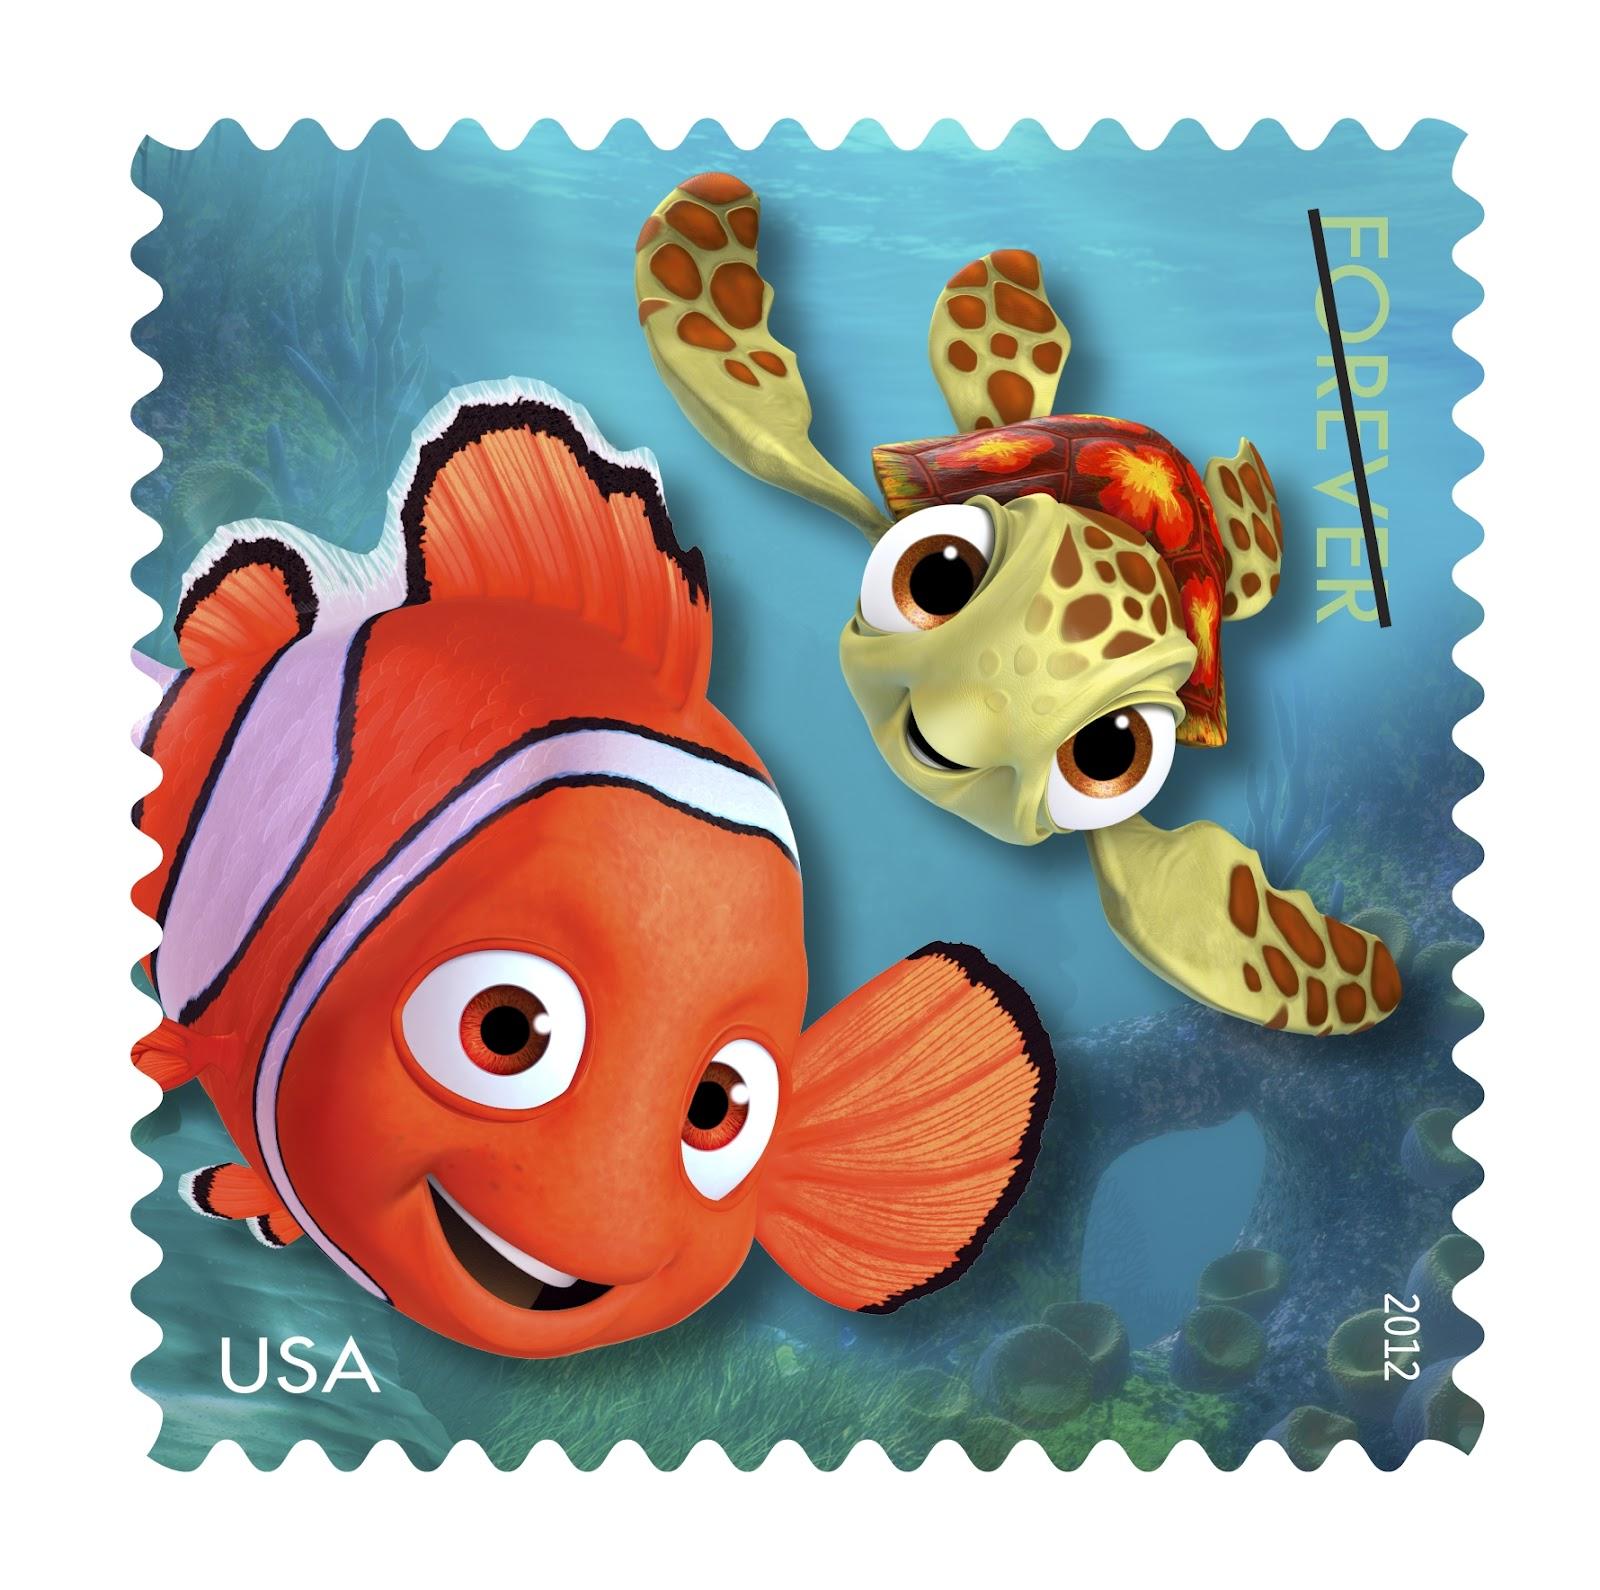 Mail A Smile Forever Stamps Celebrate Disney Pixar